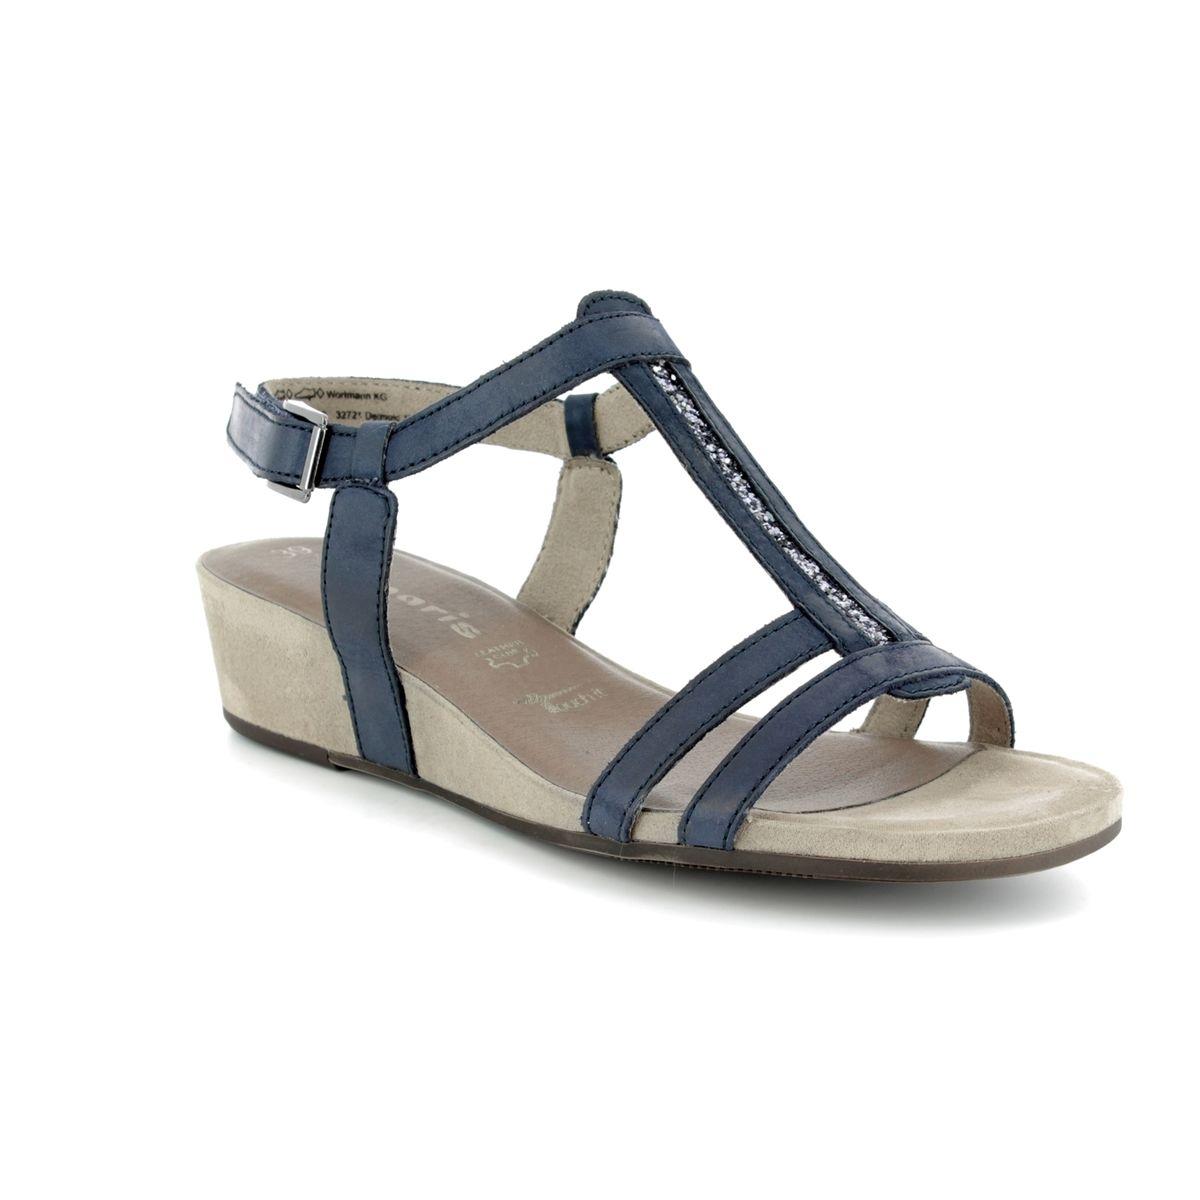 0e6b0361be4 Tamaris Wedge Sandals - Navy nubuck - 28209 20 773 EMILY  nbsp 81